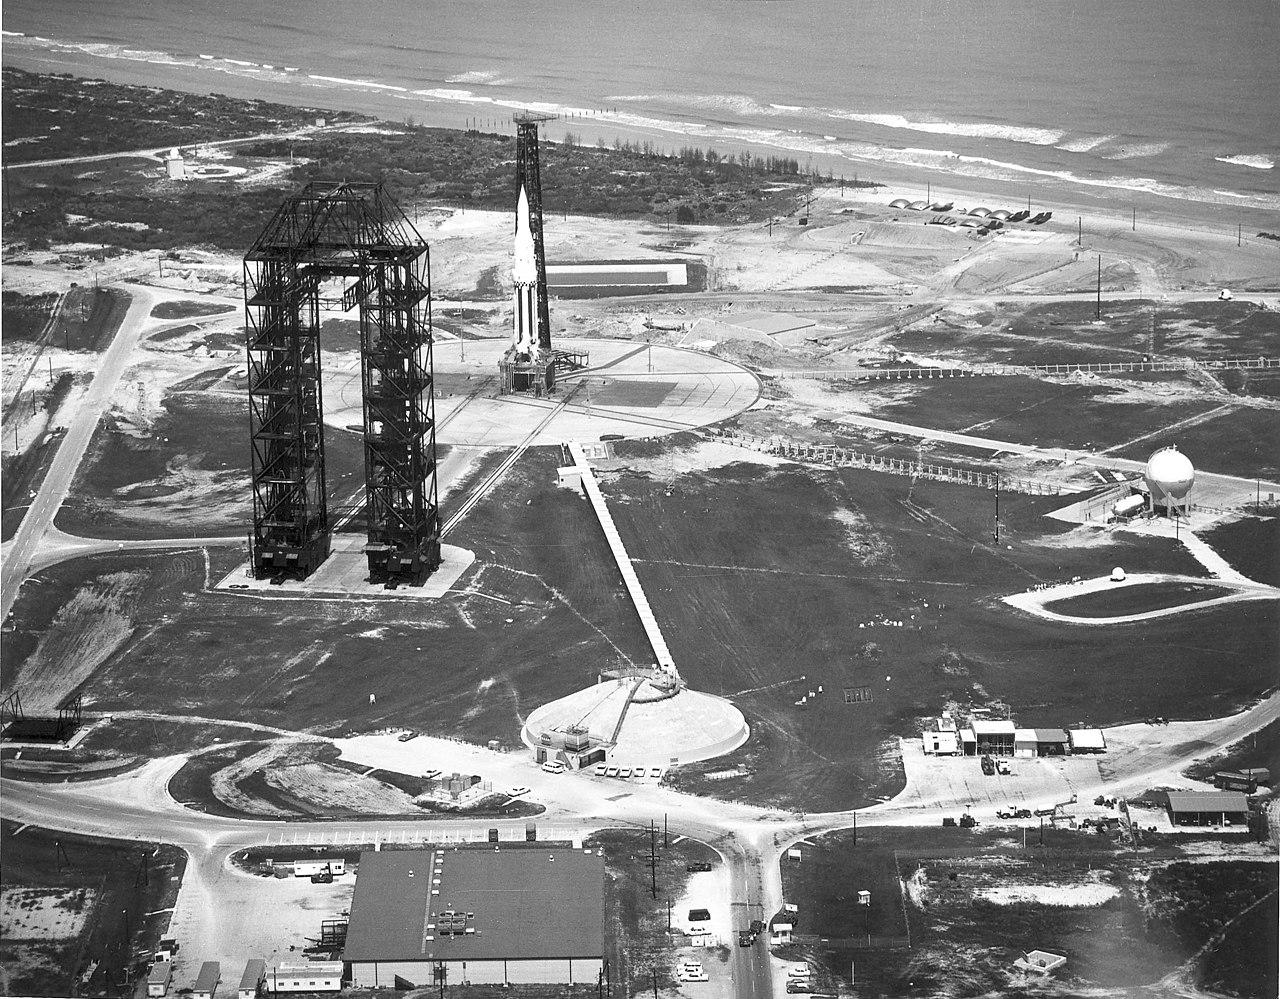 LC-34 с ракетой Saturn I SA-4 28 марта 1963 года